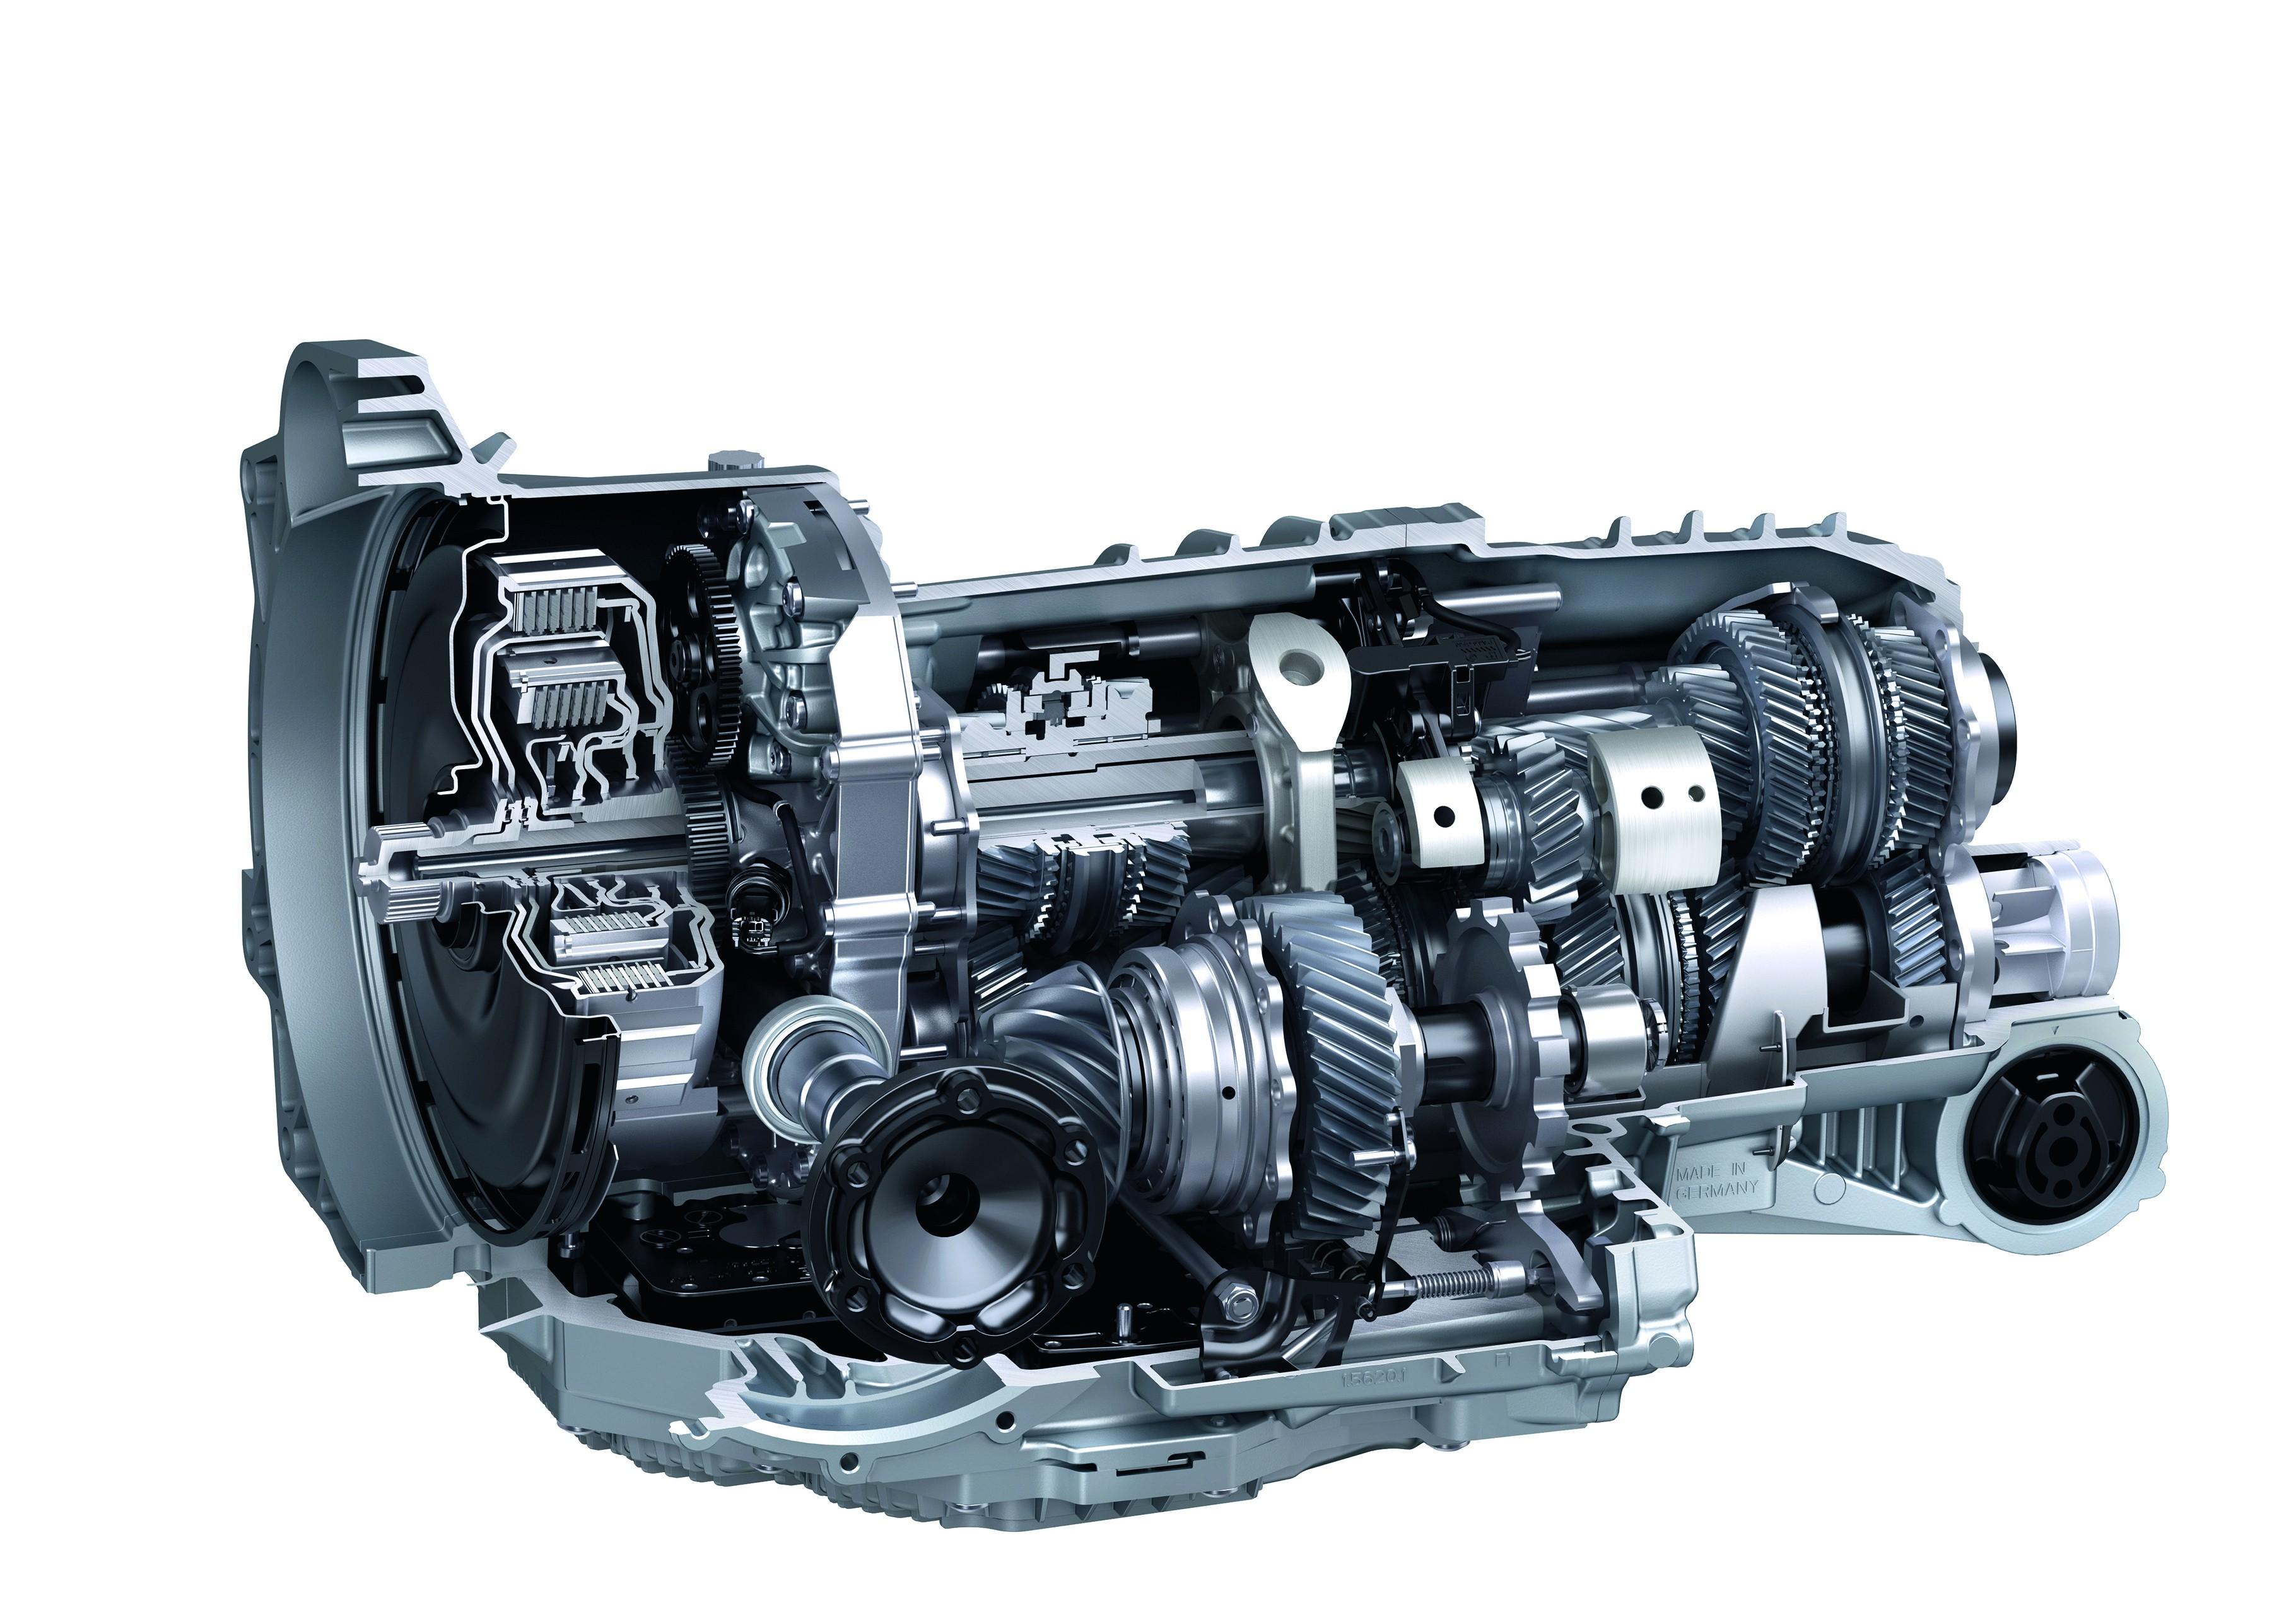 Porsche 996 Engine Diagram Seven Reasons Pdk is Better Than Manual Of Porsche 996 Engine Diagram